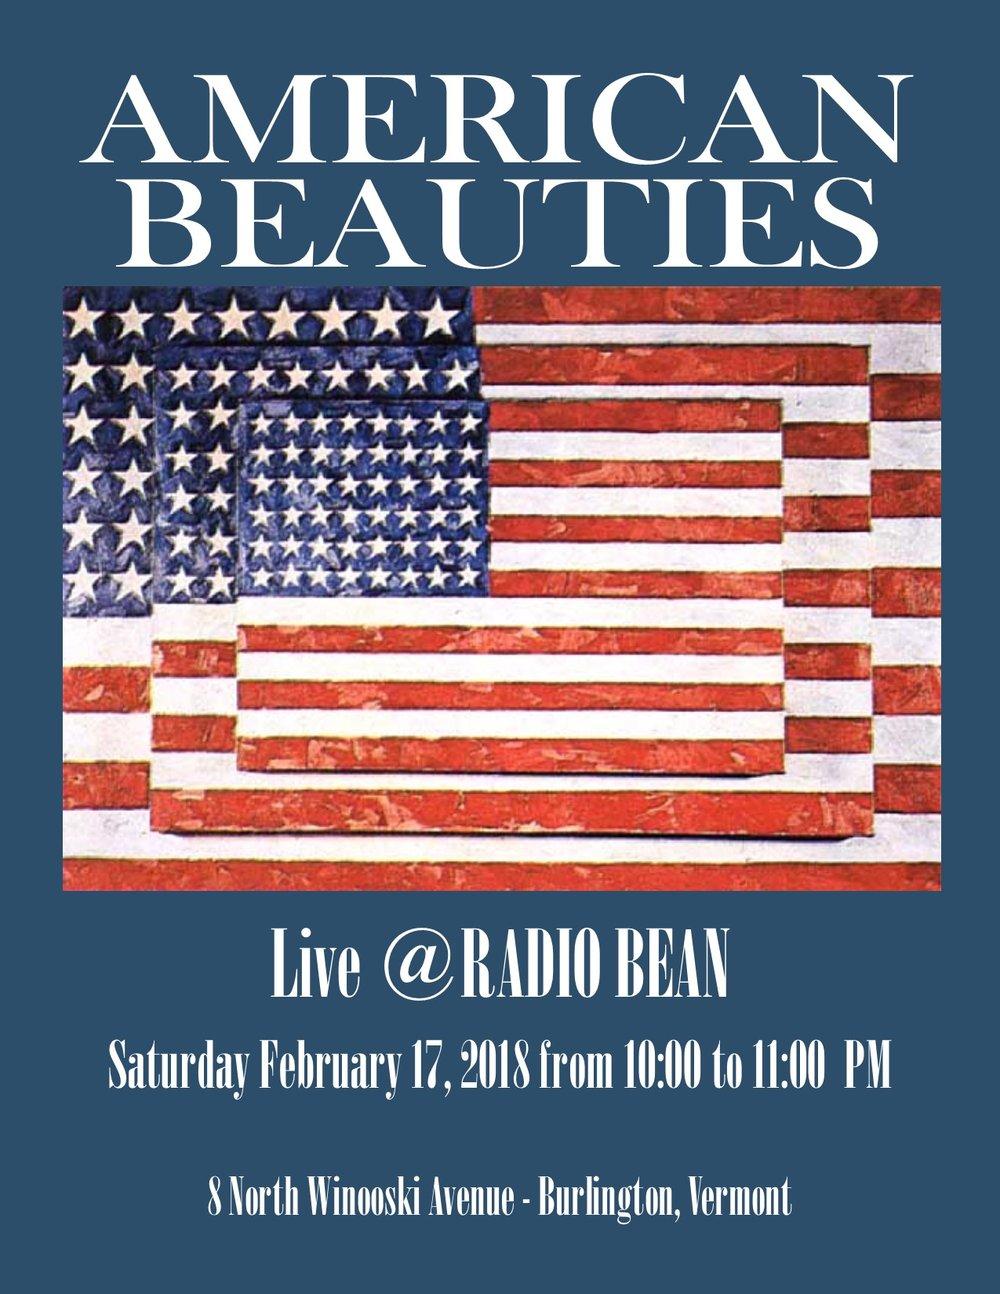 Radio Bean February 17 2018.jpg